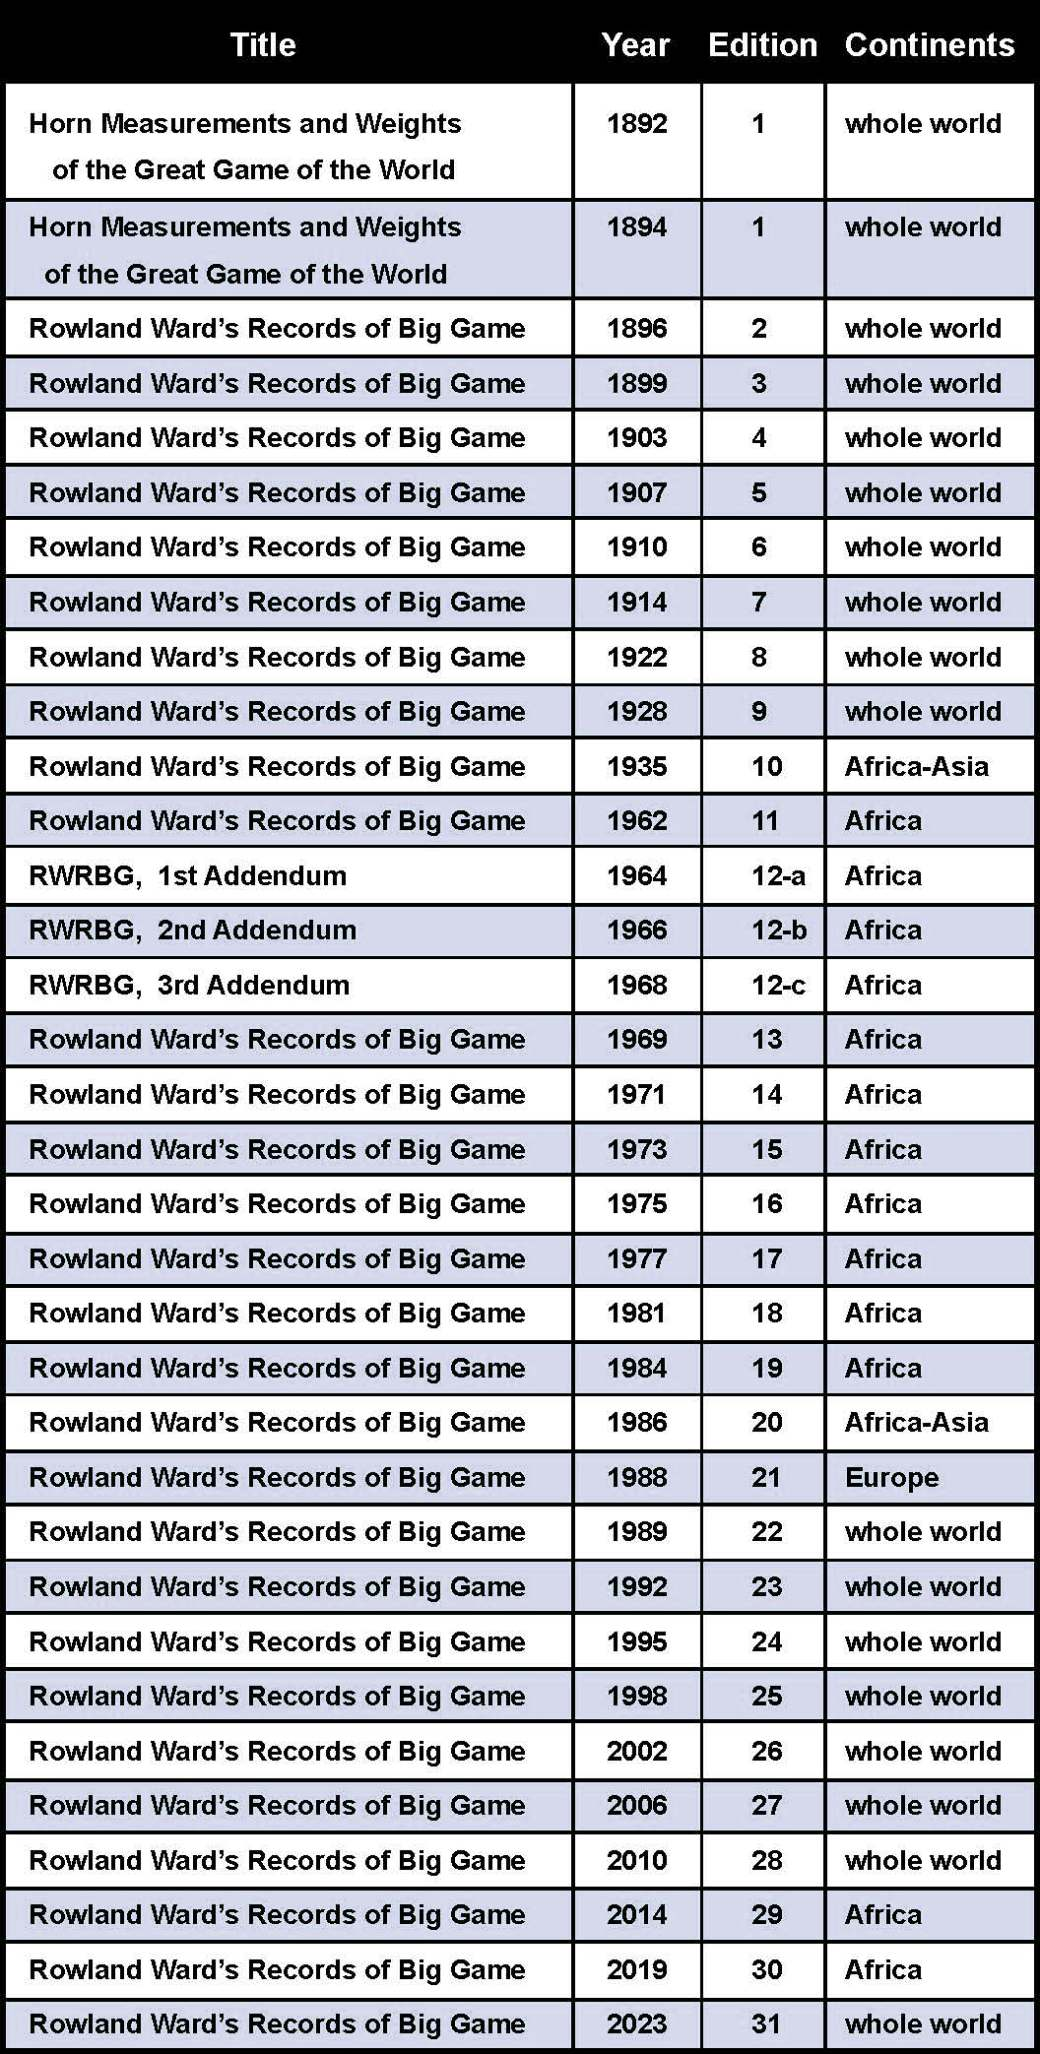 RW History of publications